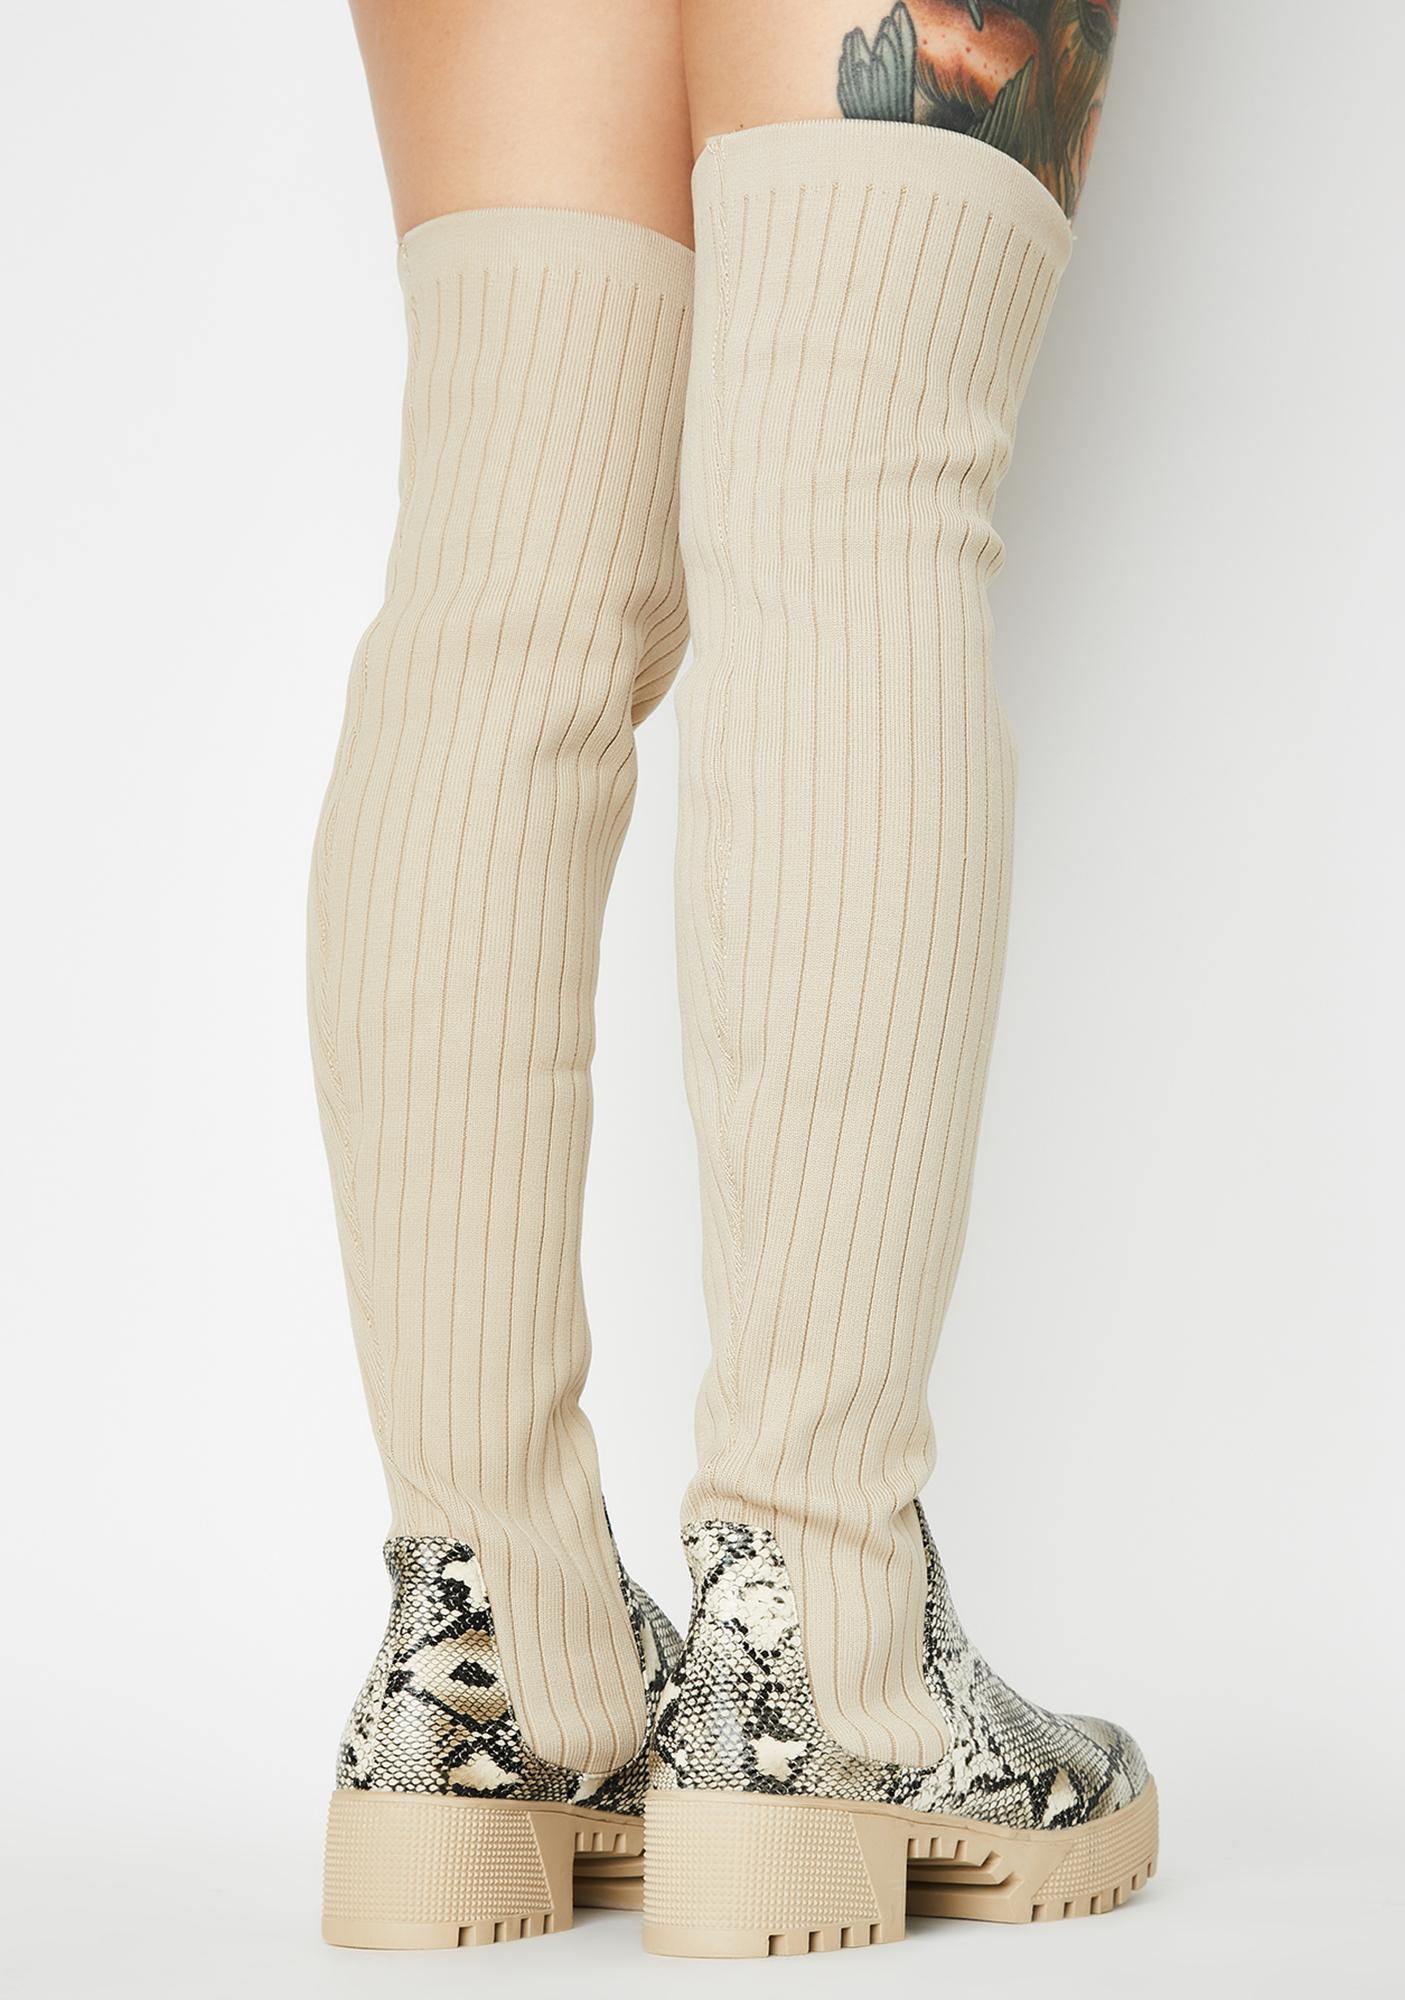 Toxic Baddie Bae Knee High Boots